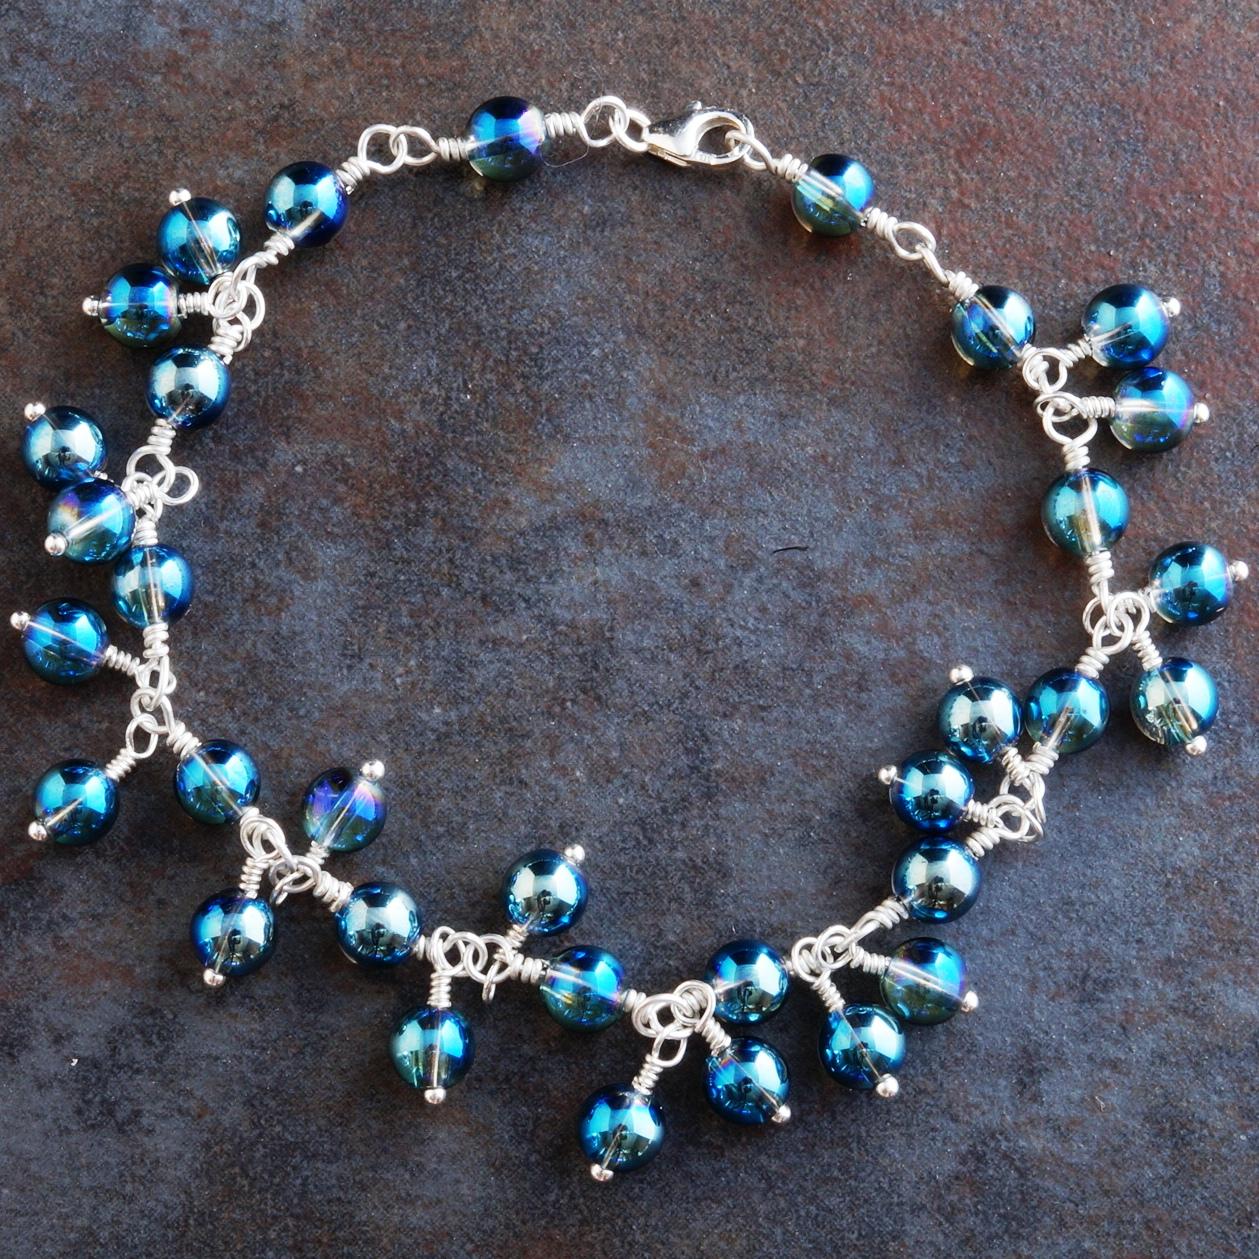 Handmade Sterling Silver Blue Mystic Quartz Charm Bracelet